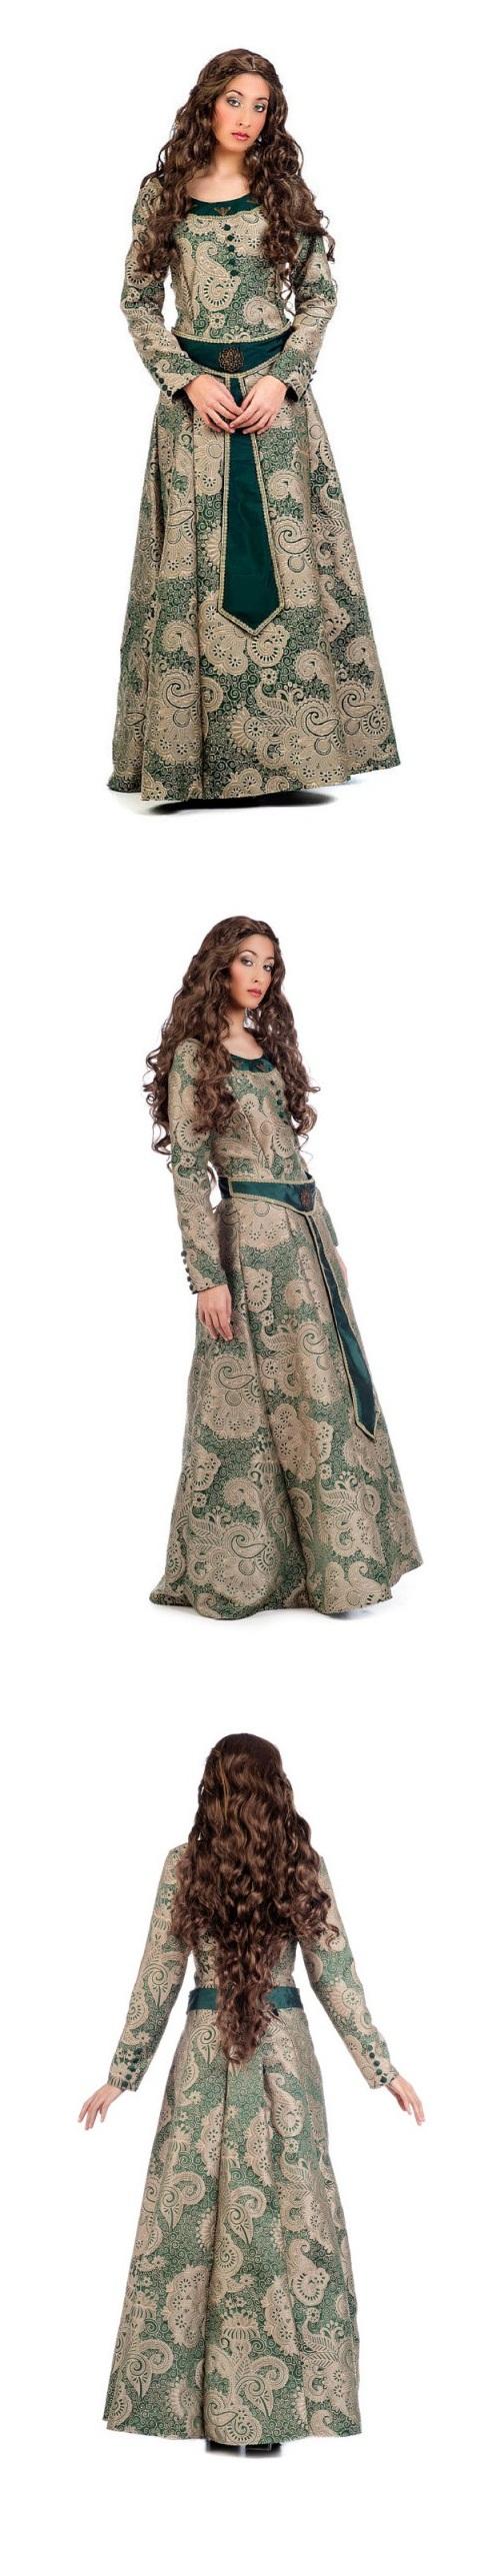 Trajes medievales mujer lujo